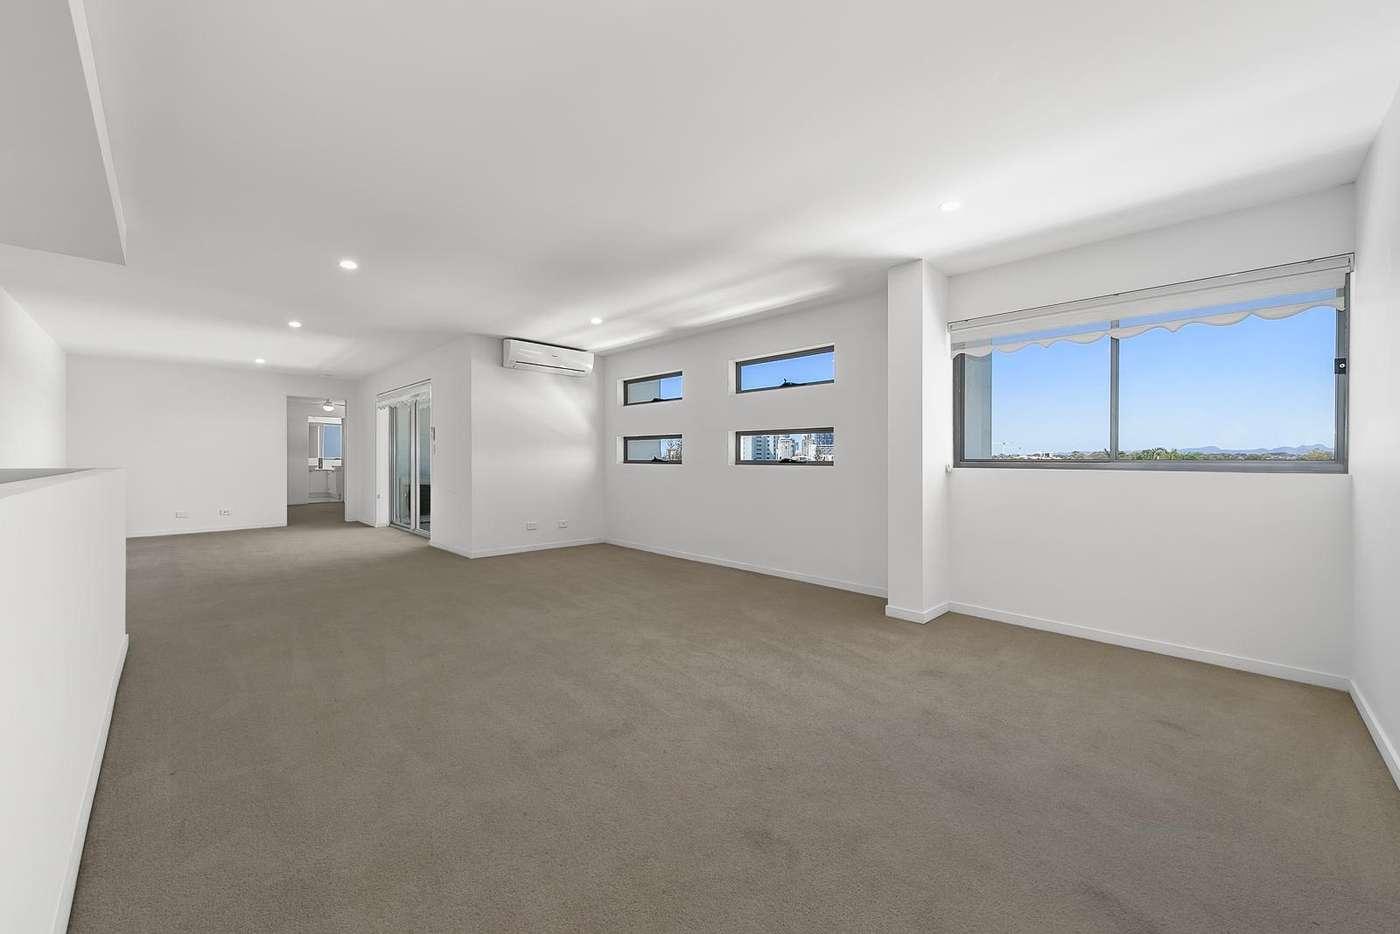 Main view of Homely apartment listing, 29/8 Bradford Street, Labrador QLD 4215